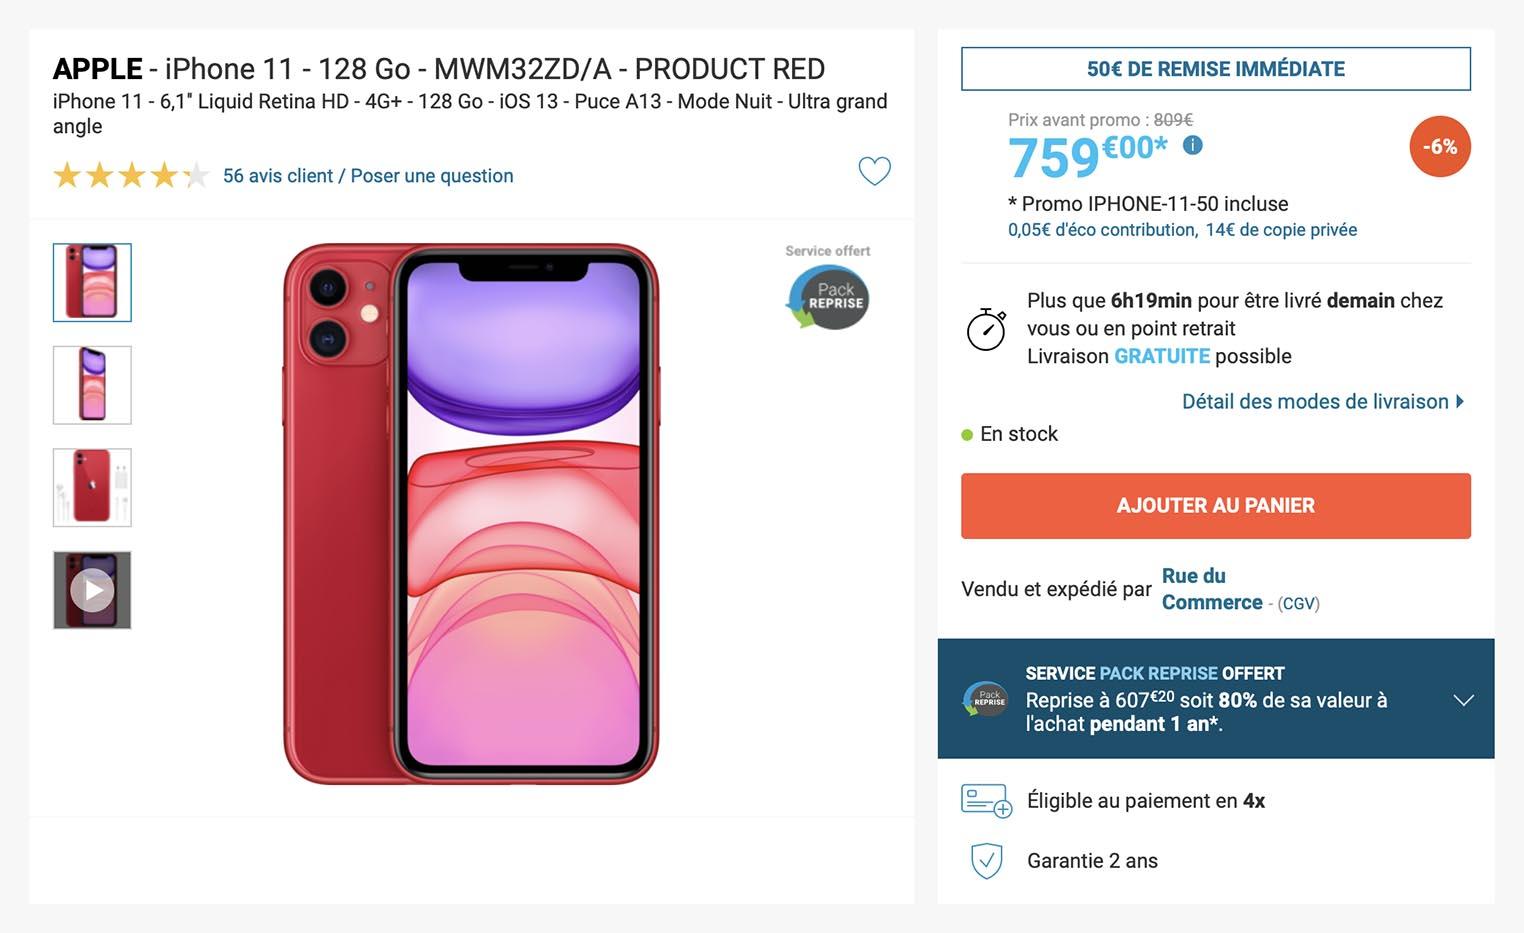 iPhone 11 Rue du Commerce